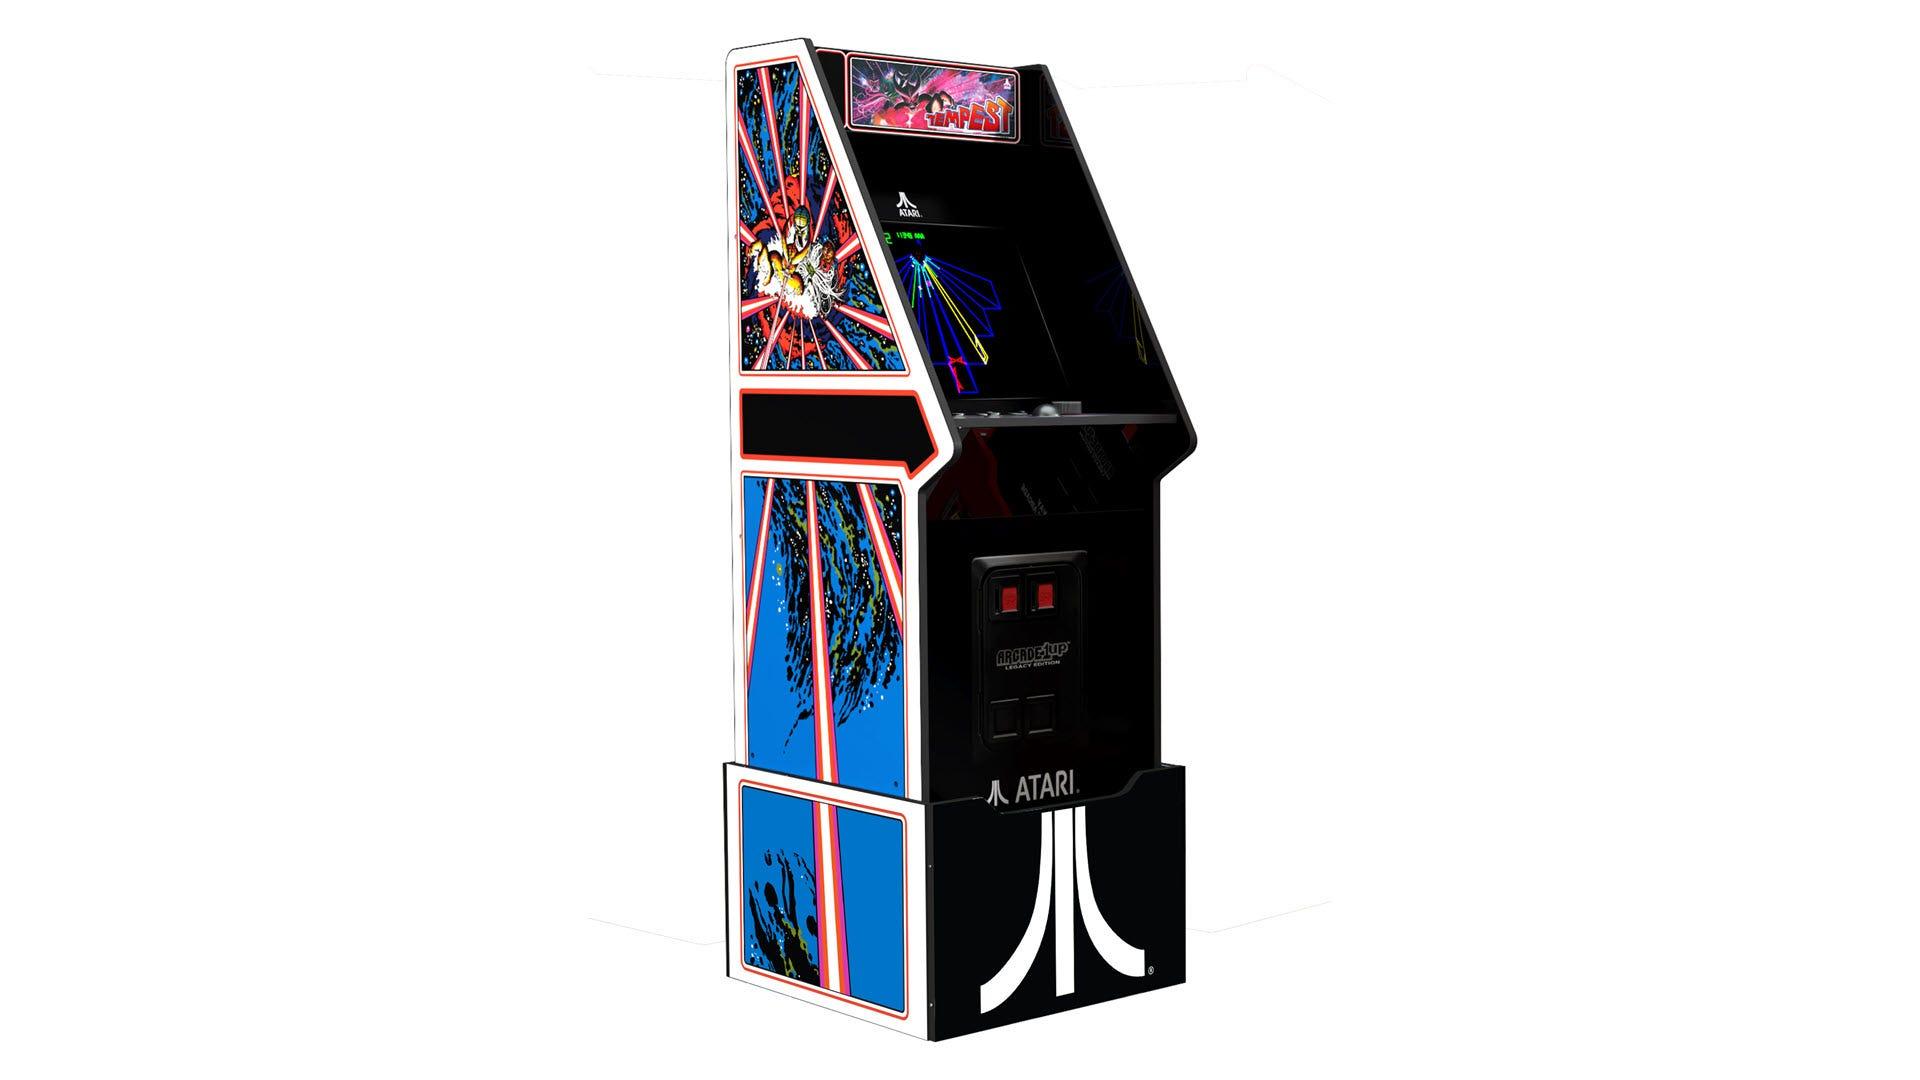 A classic looking 'Atari' Machine